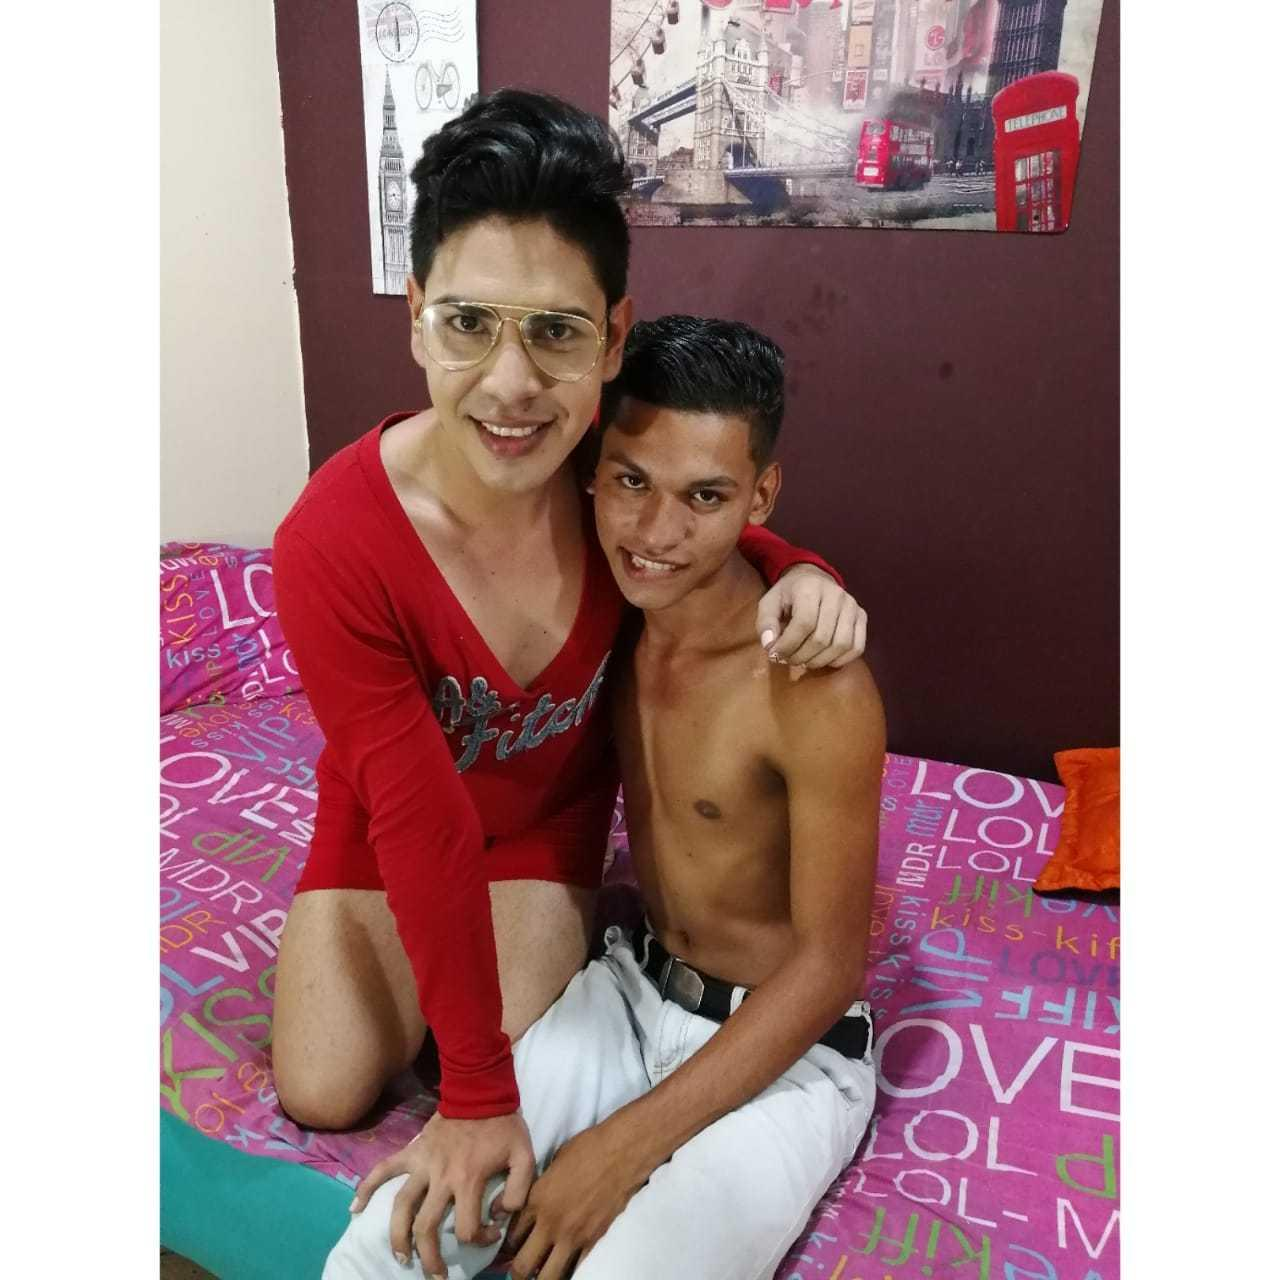 Online Cam Boys cam porno with axelwithadam, this brunet hairy pubis homo couple